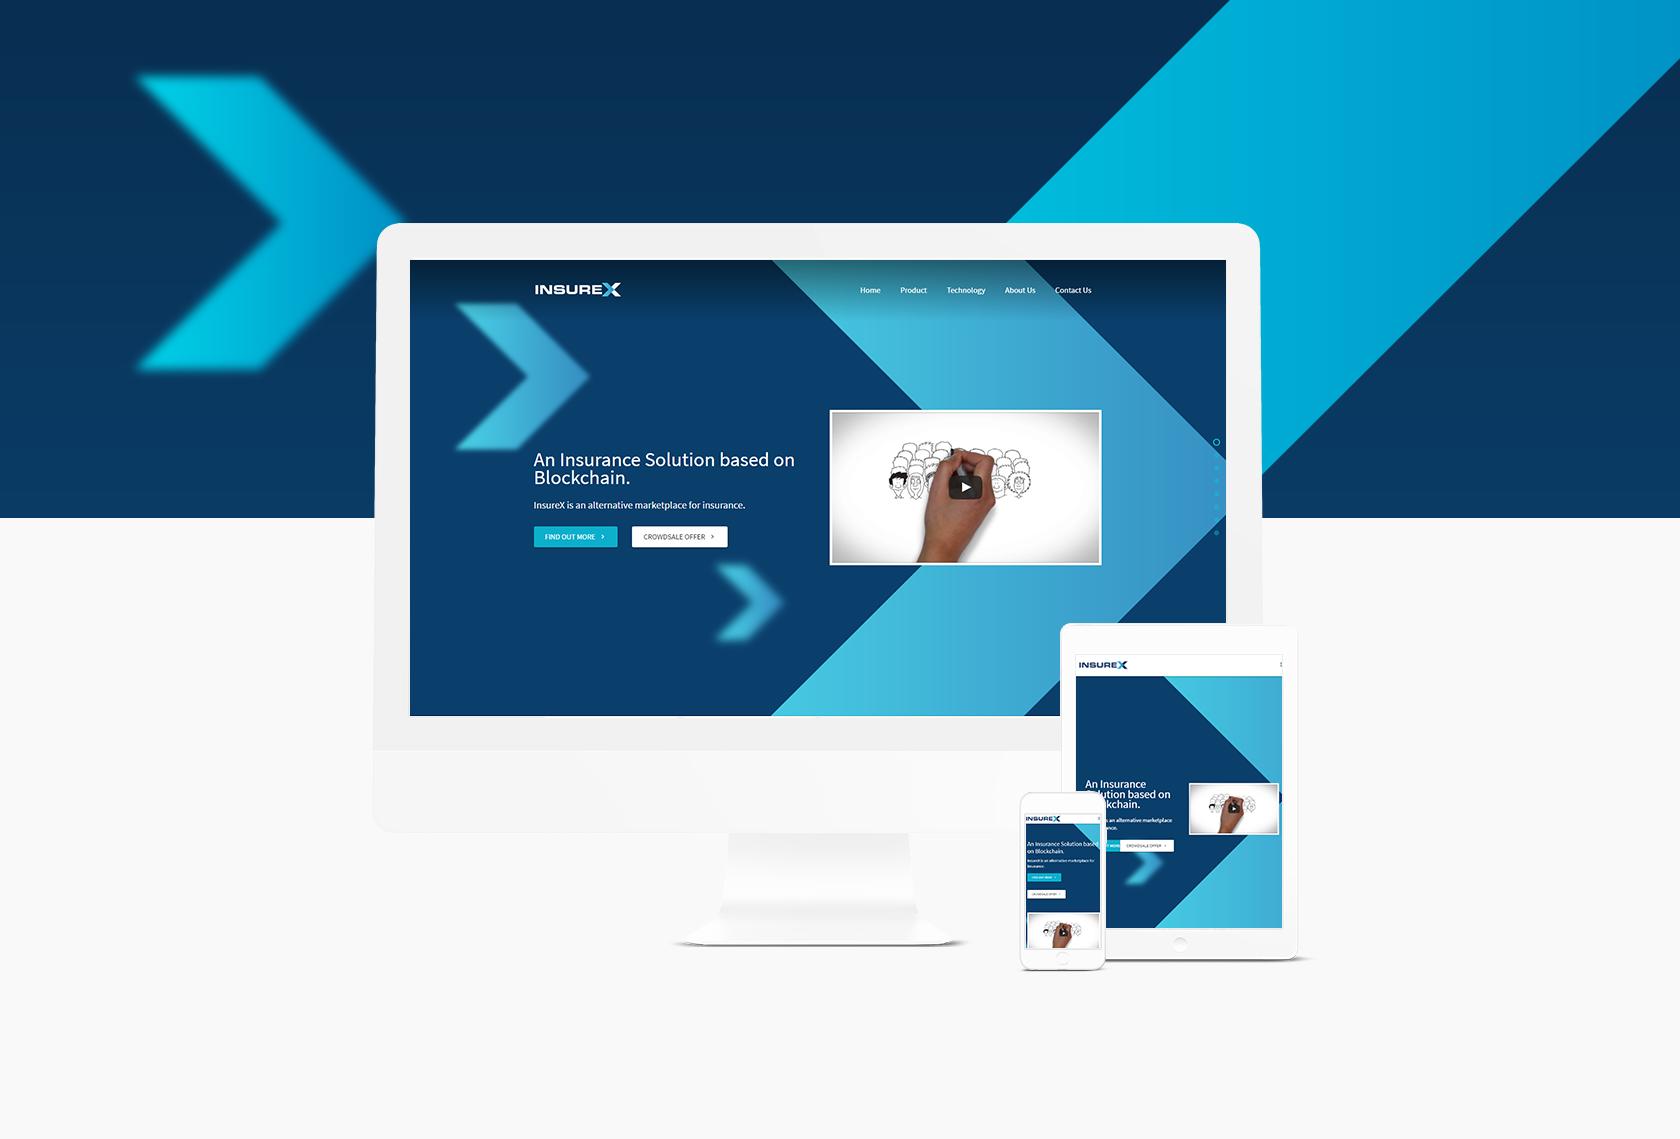 InsureX Responsive 1 - InsureX (Branding) - Creative Digital